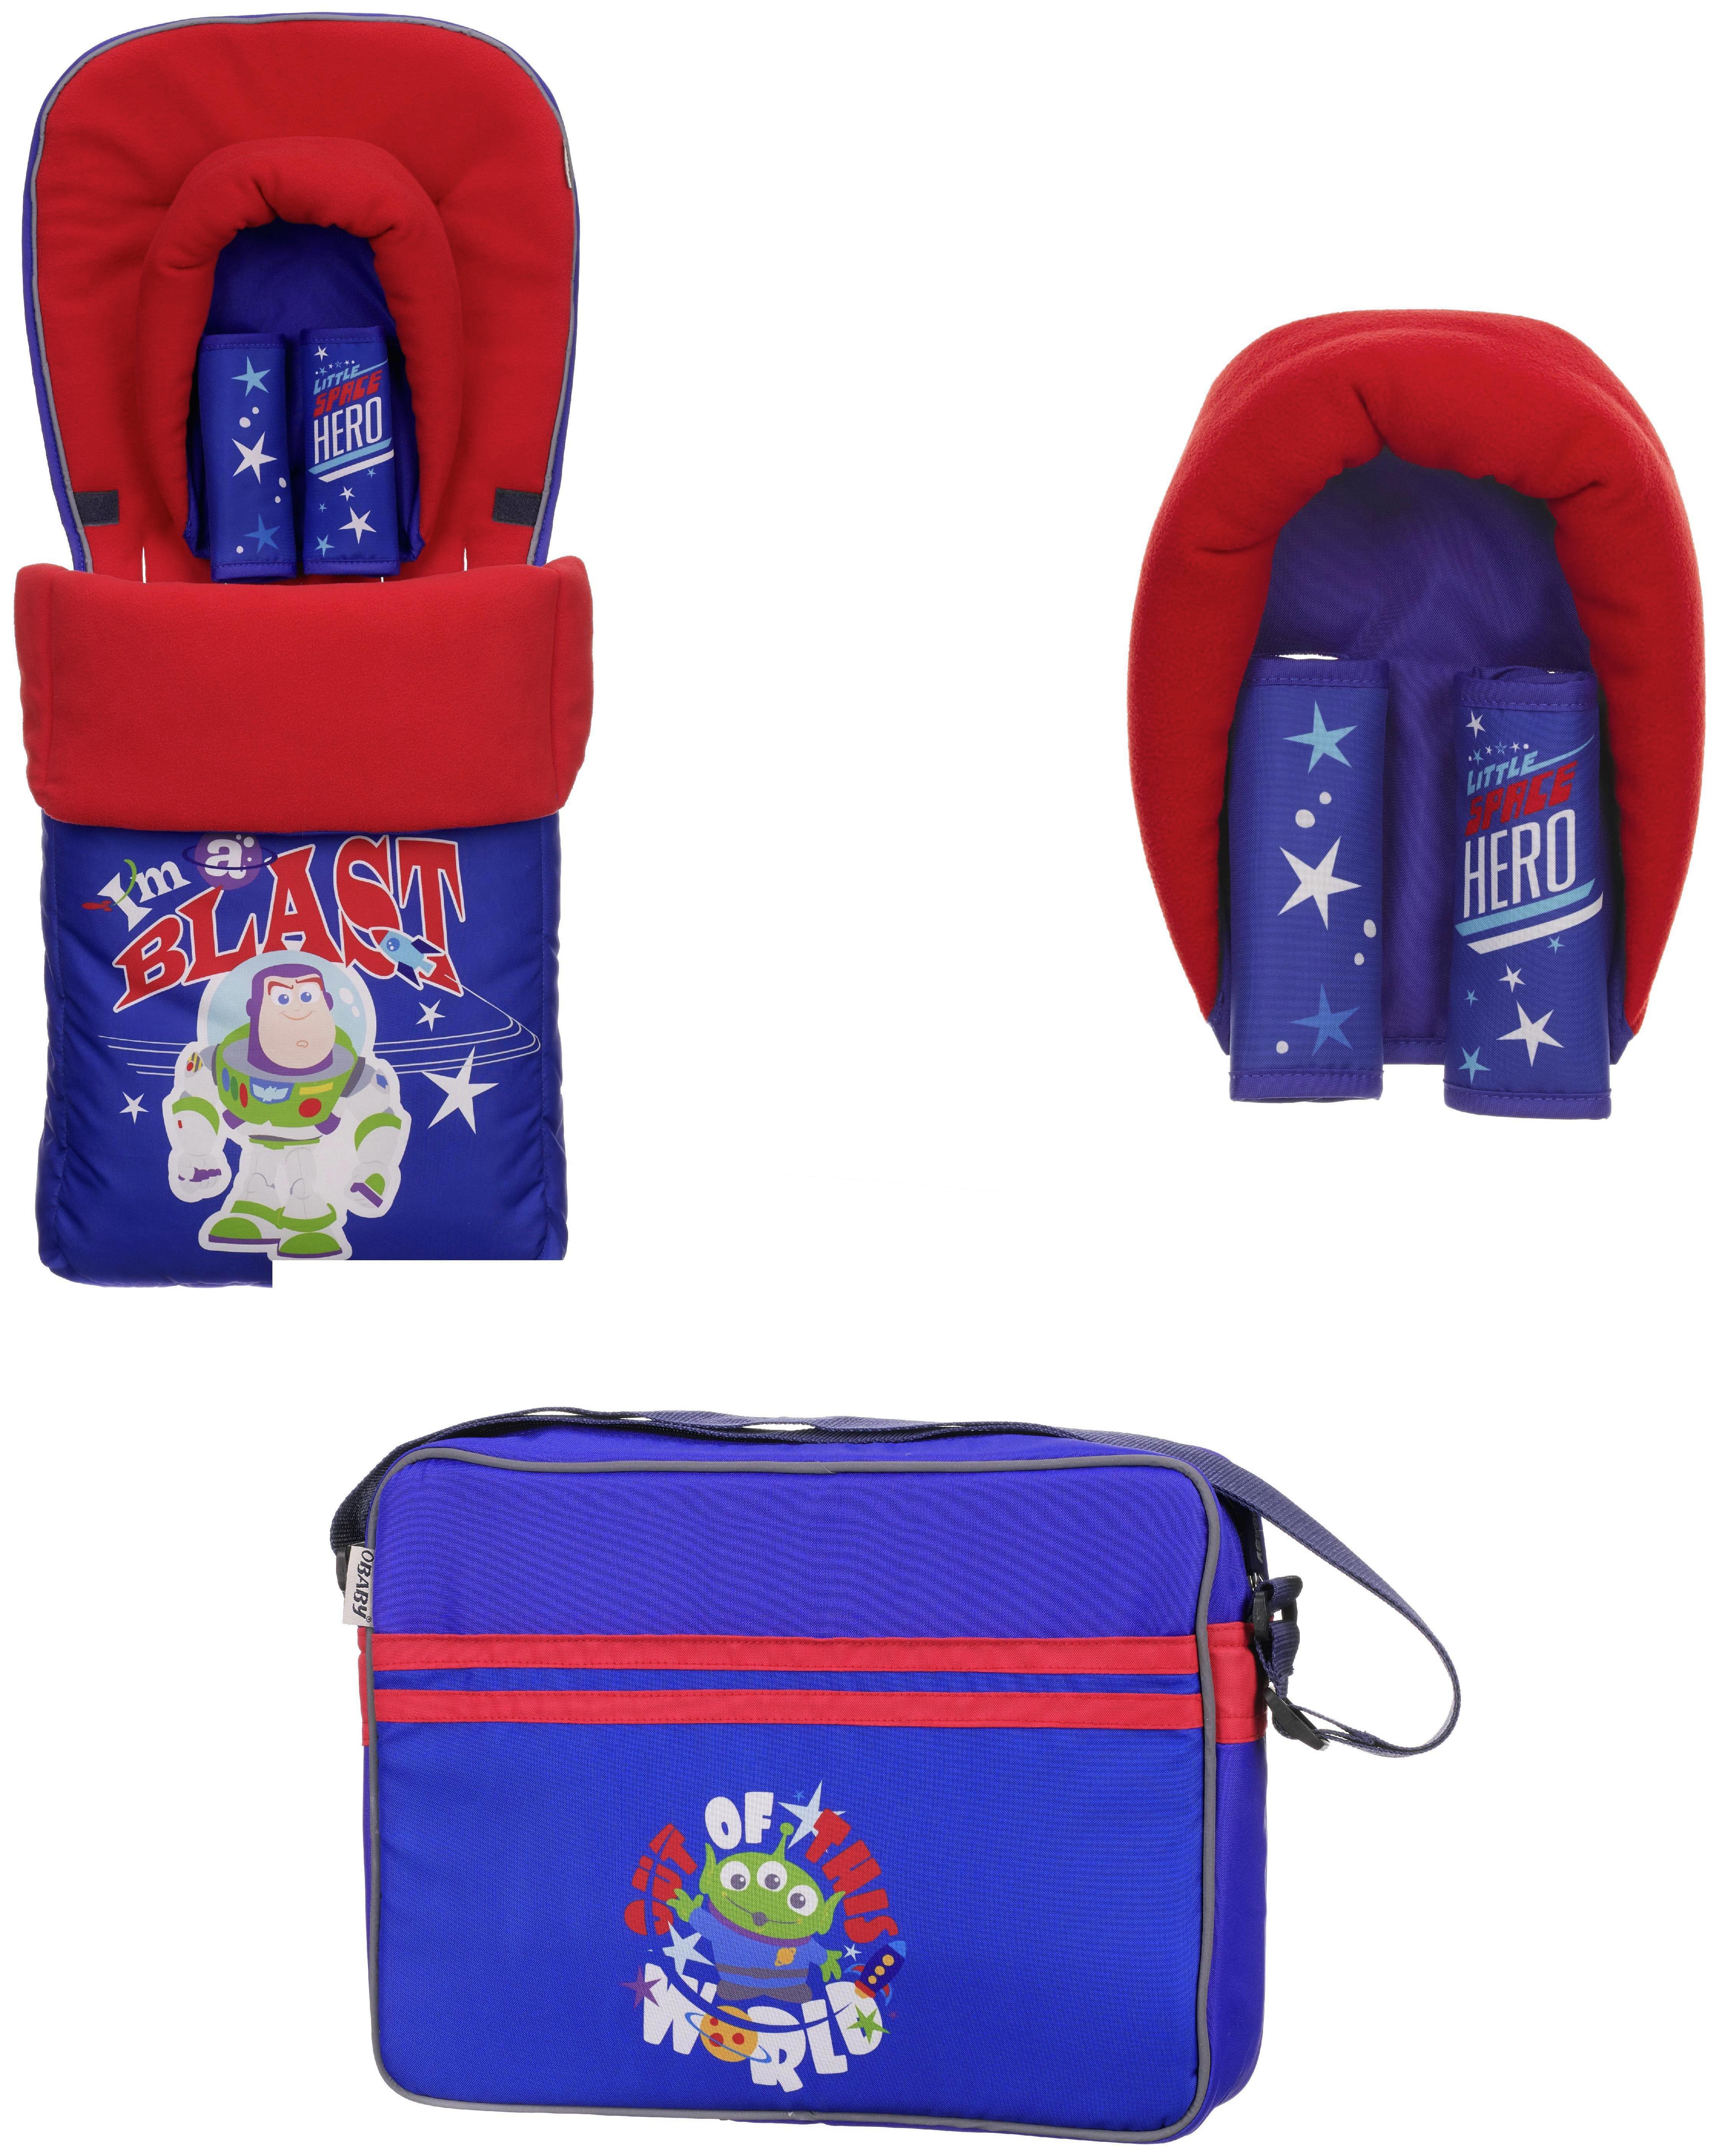 Image of Disney - Buzz Lightyear Blue Pushchair Accessories Bundle